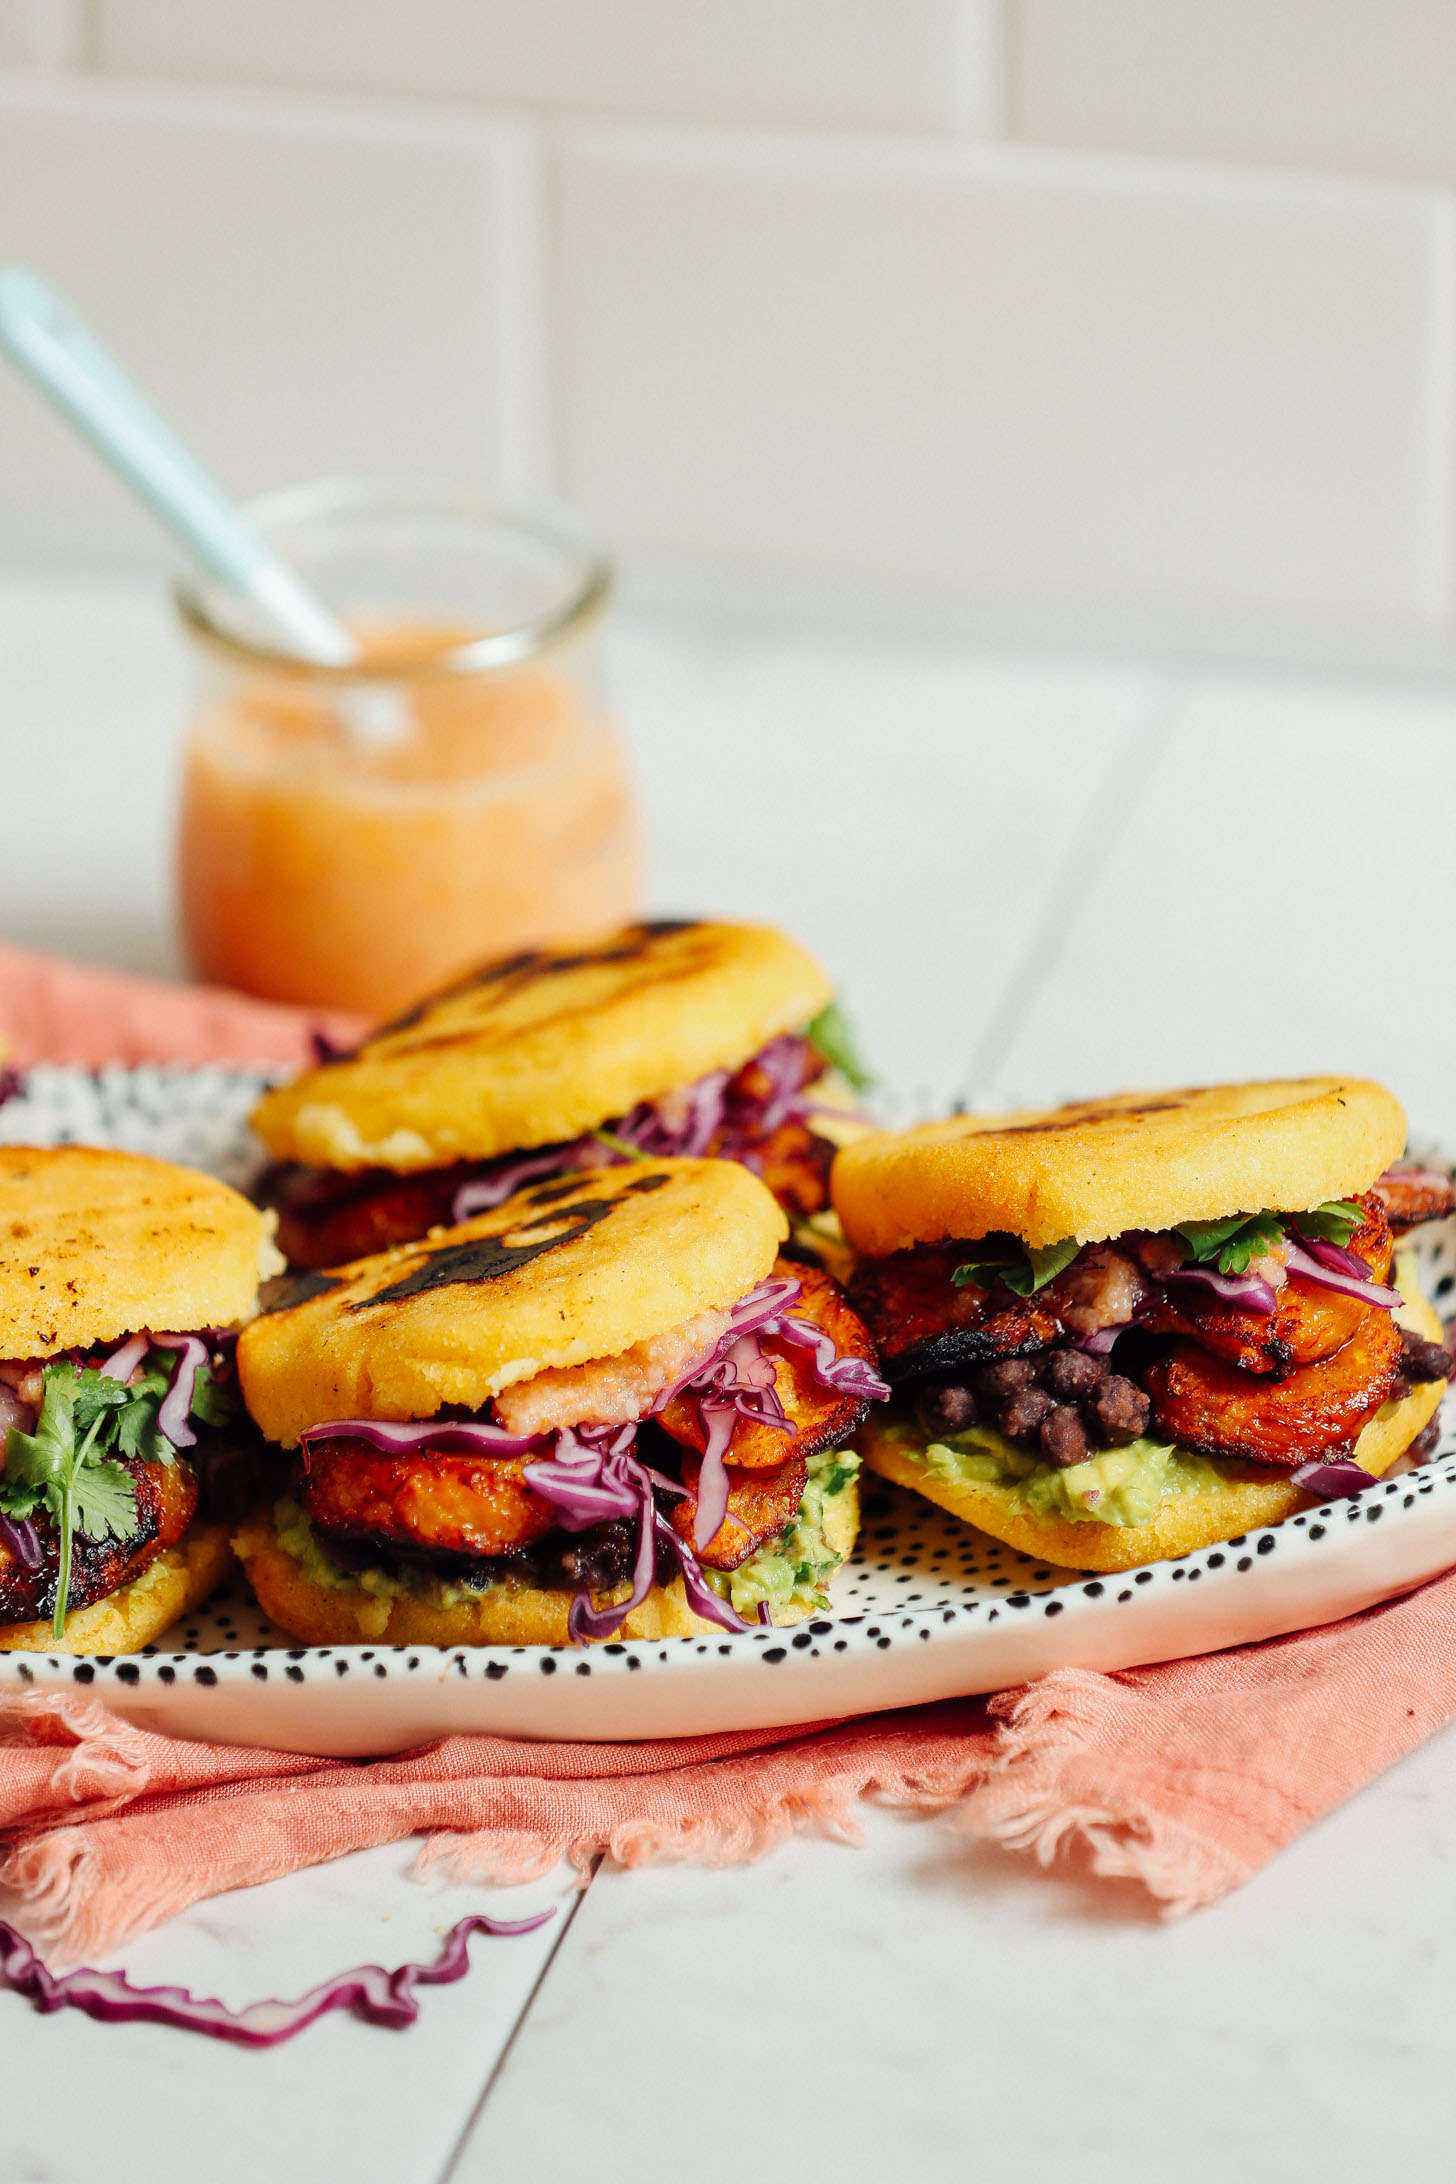 Platter filled with gluten-free Vegan Arepa Sandwiches